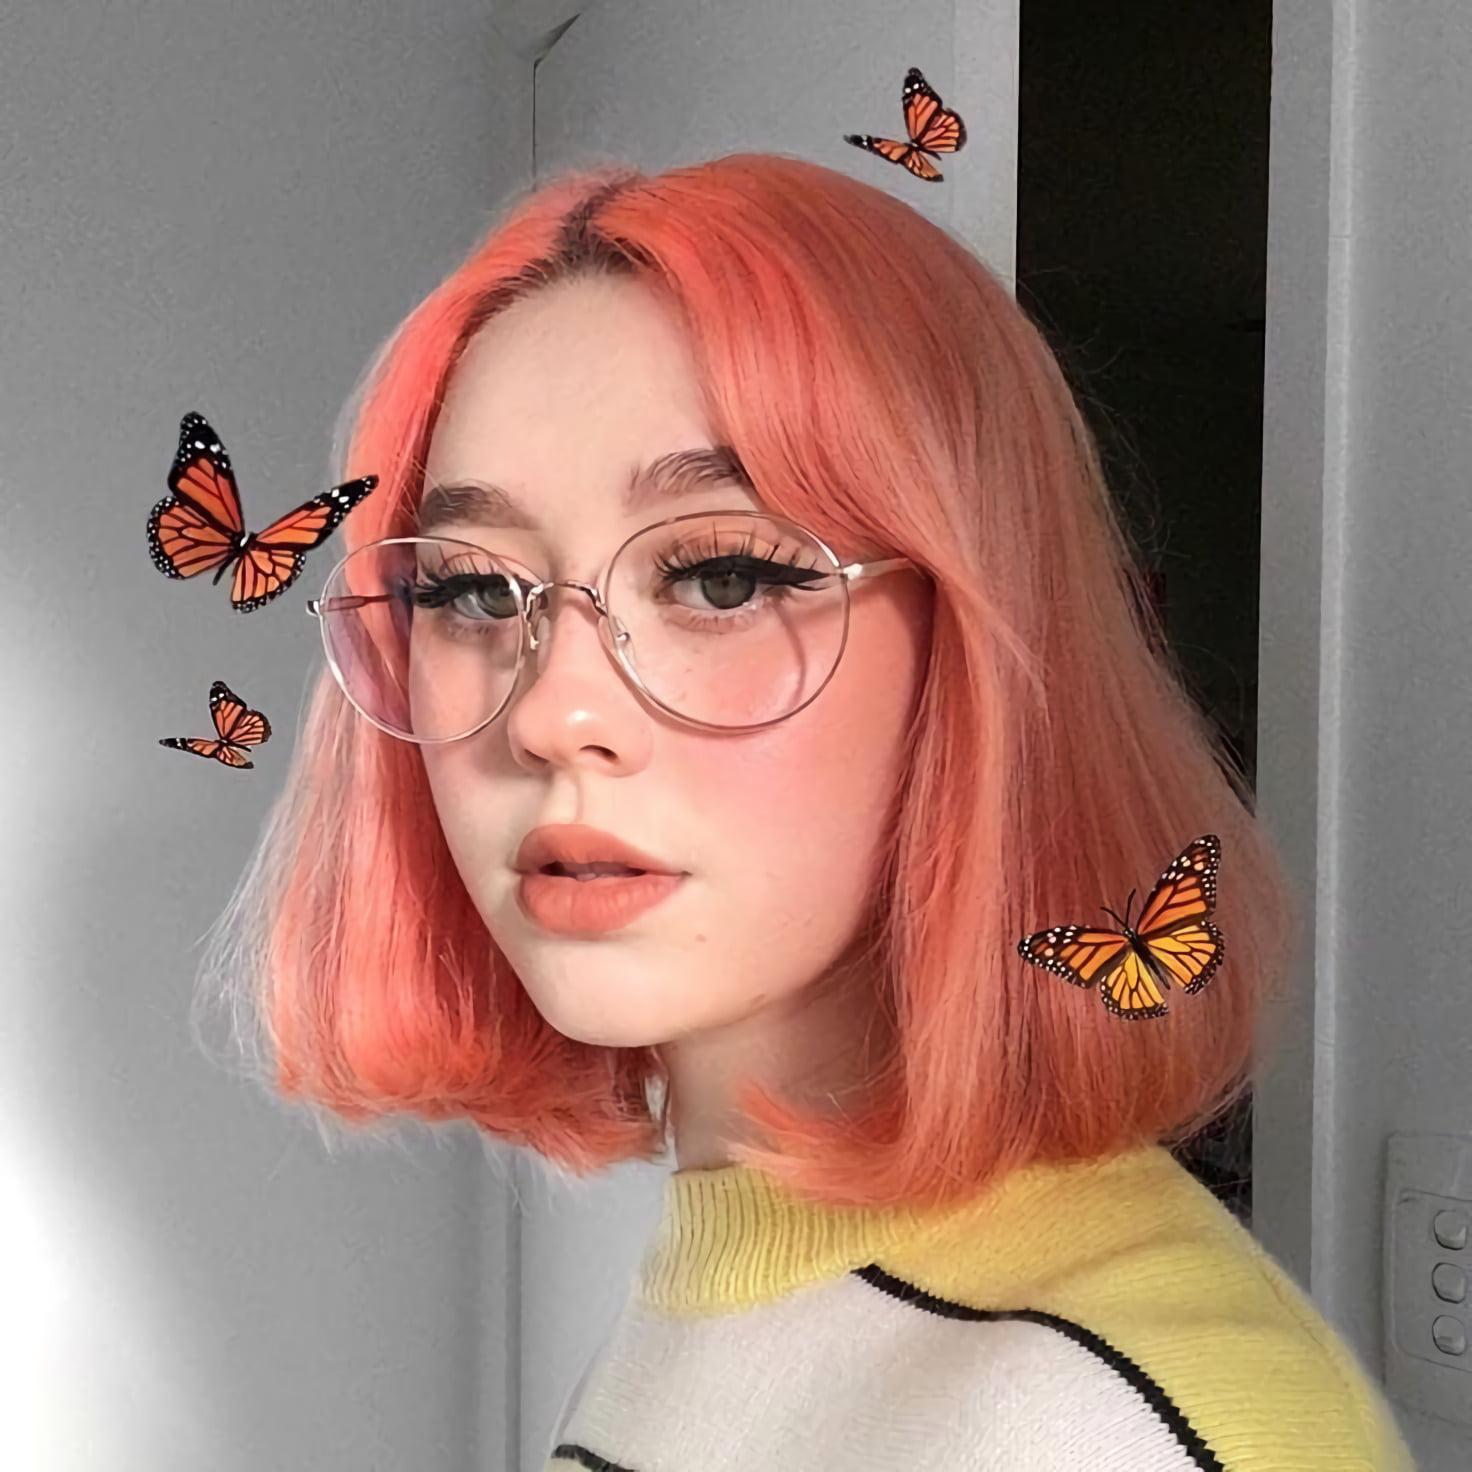 розовые волосы e-girl